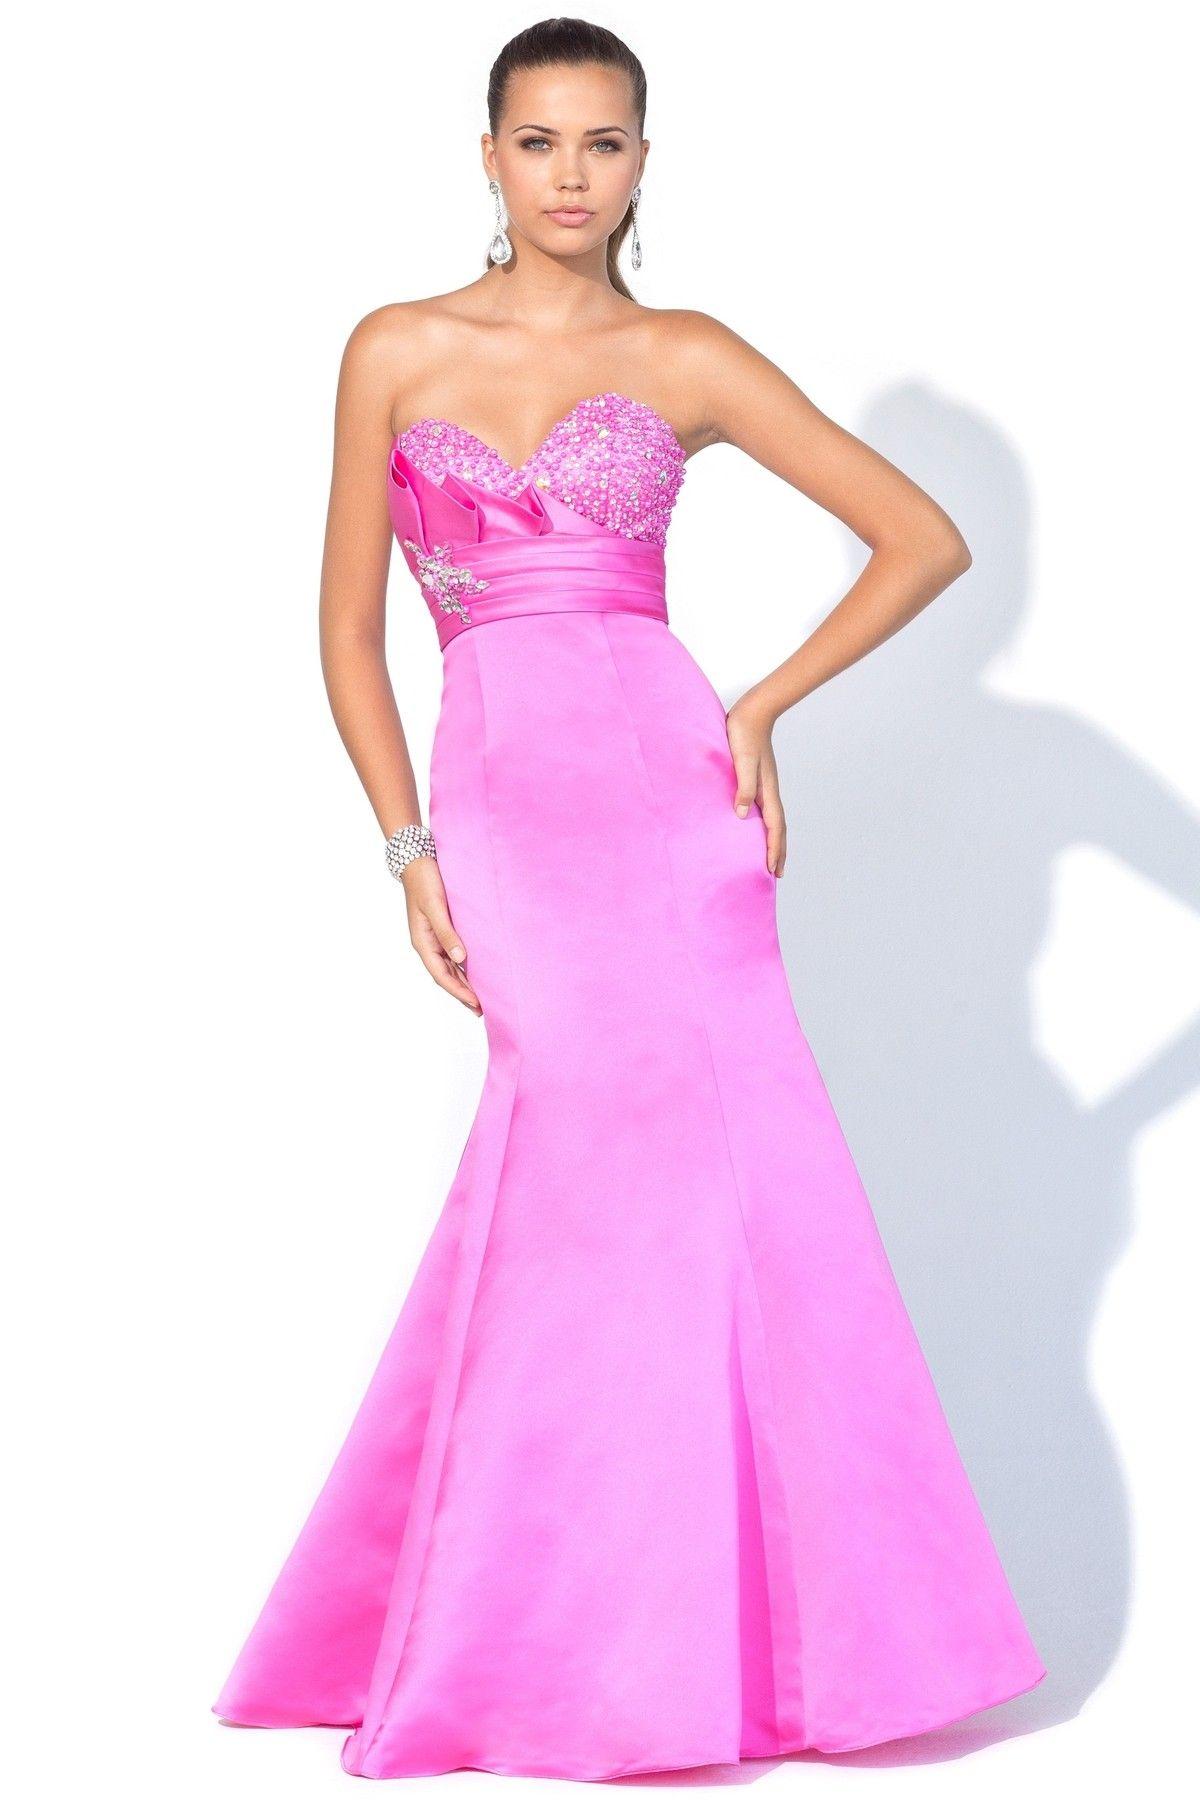 Satin modified sweetheart neckline floorlength prom dress prom